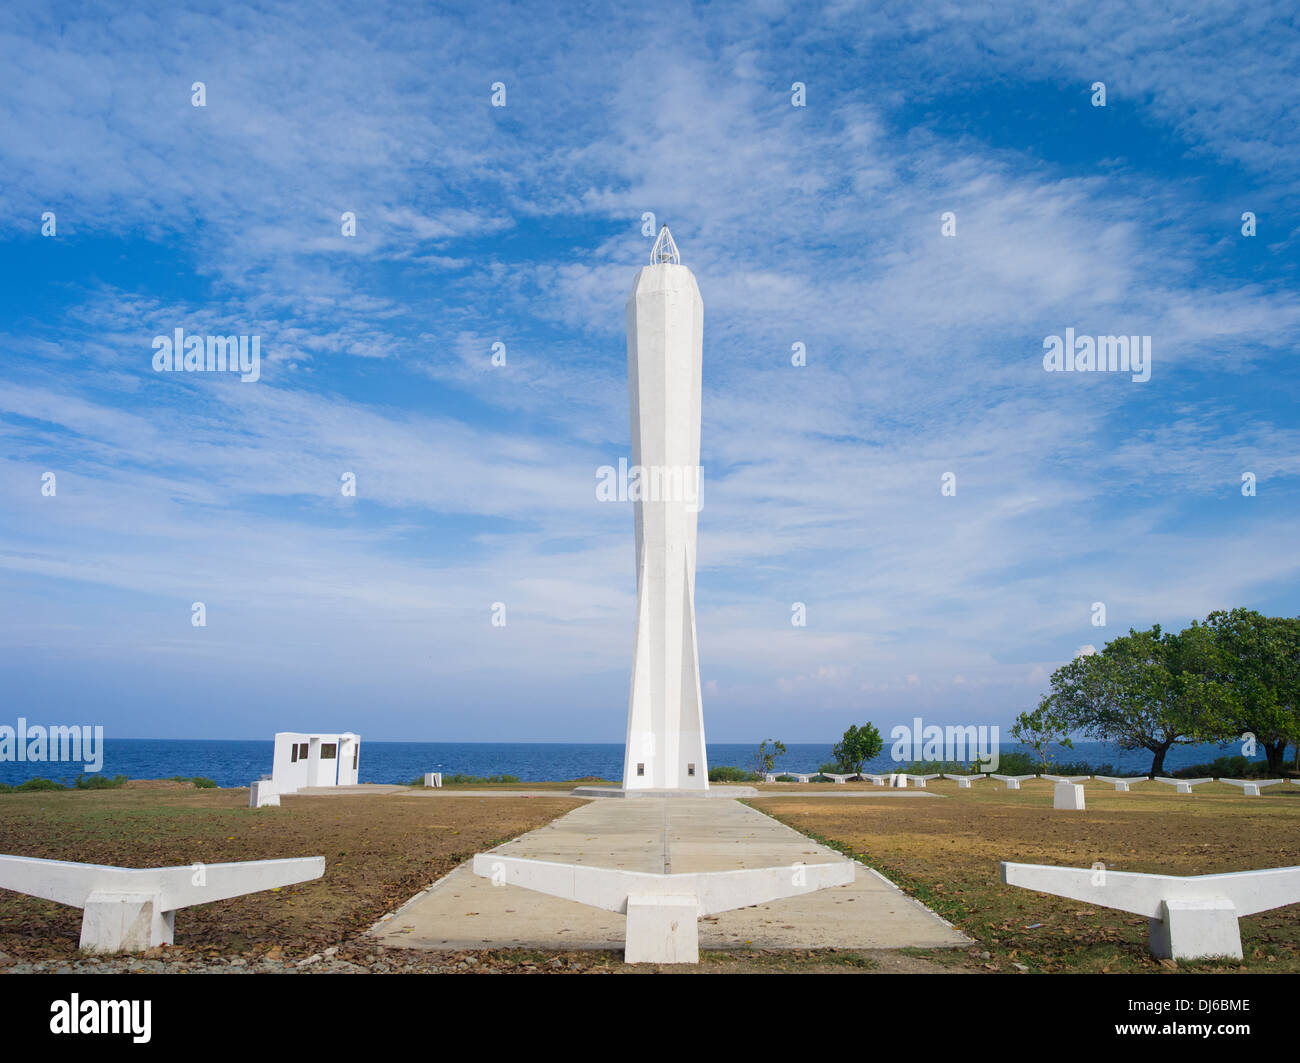 Coastwatchers Memorial Beacon, Madang, Papua New Guinea - Stock Image